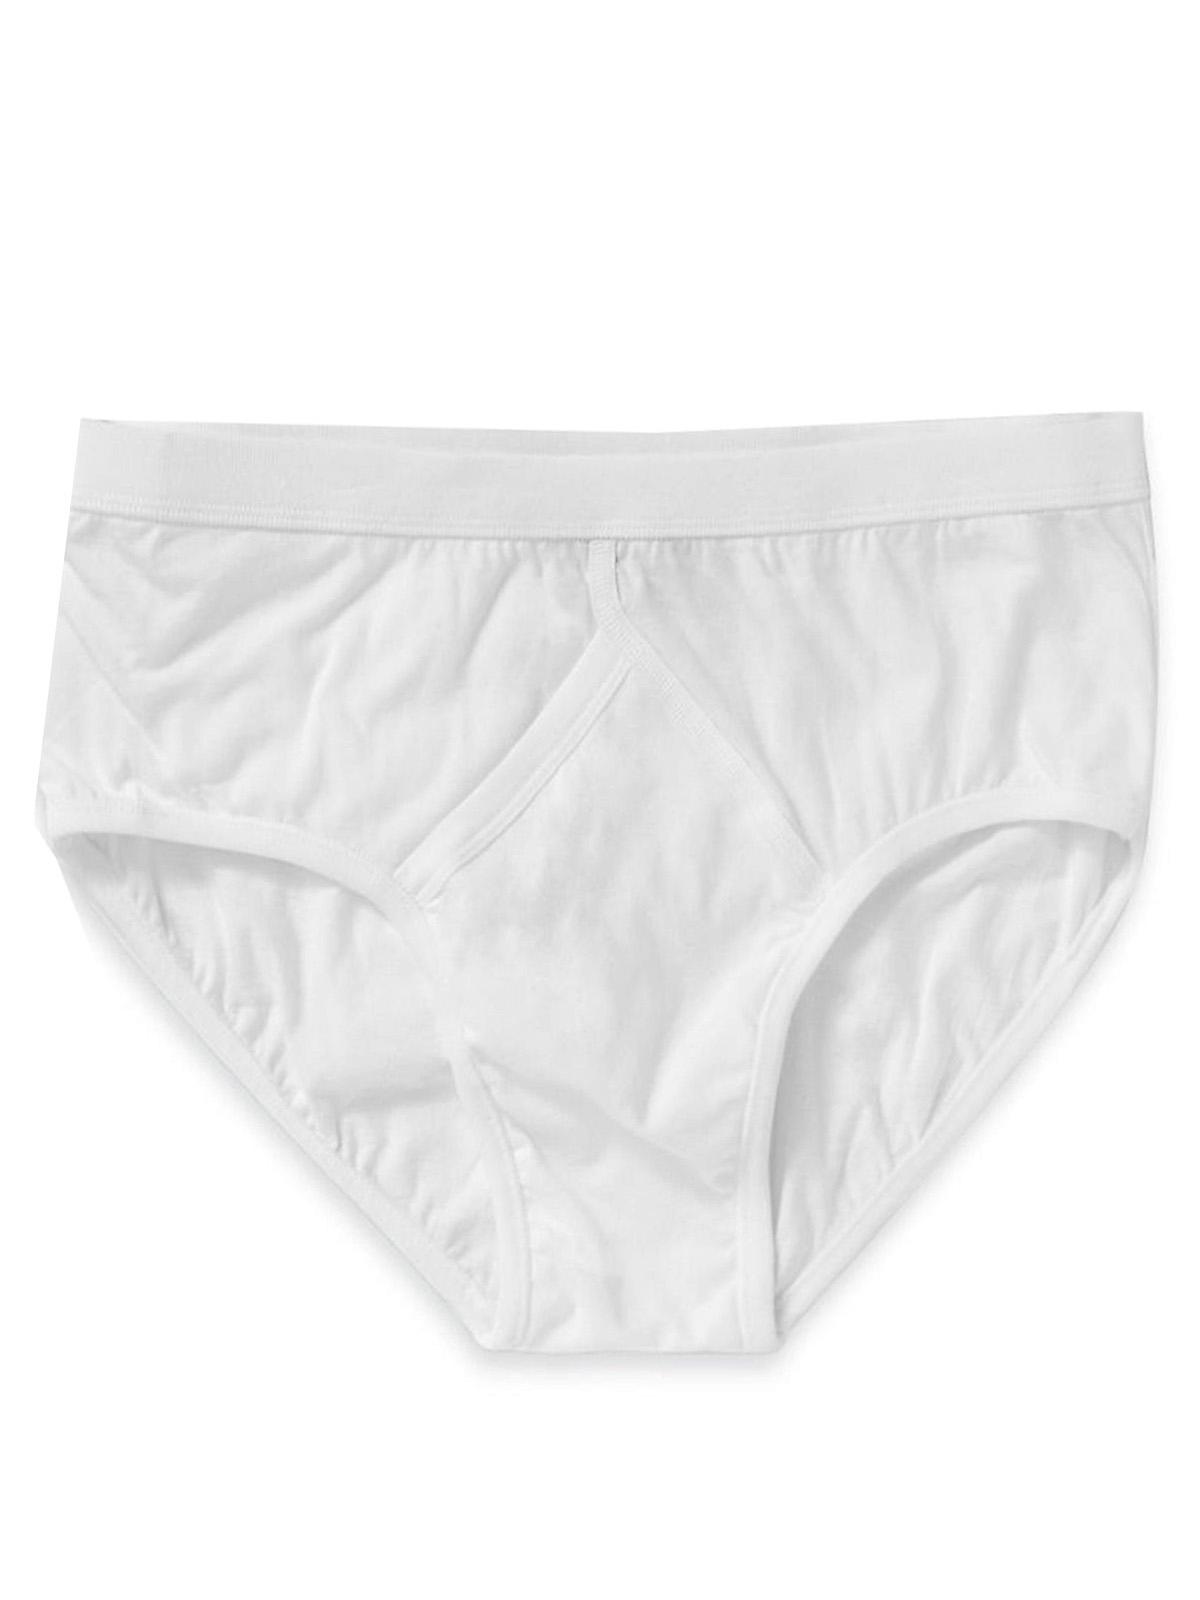 M&5 WHITE Mens Pure Cotton StayNew Briefs - Size Medium to XXL